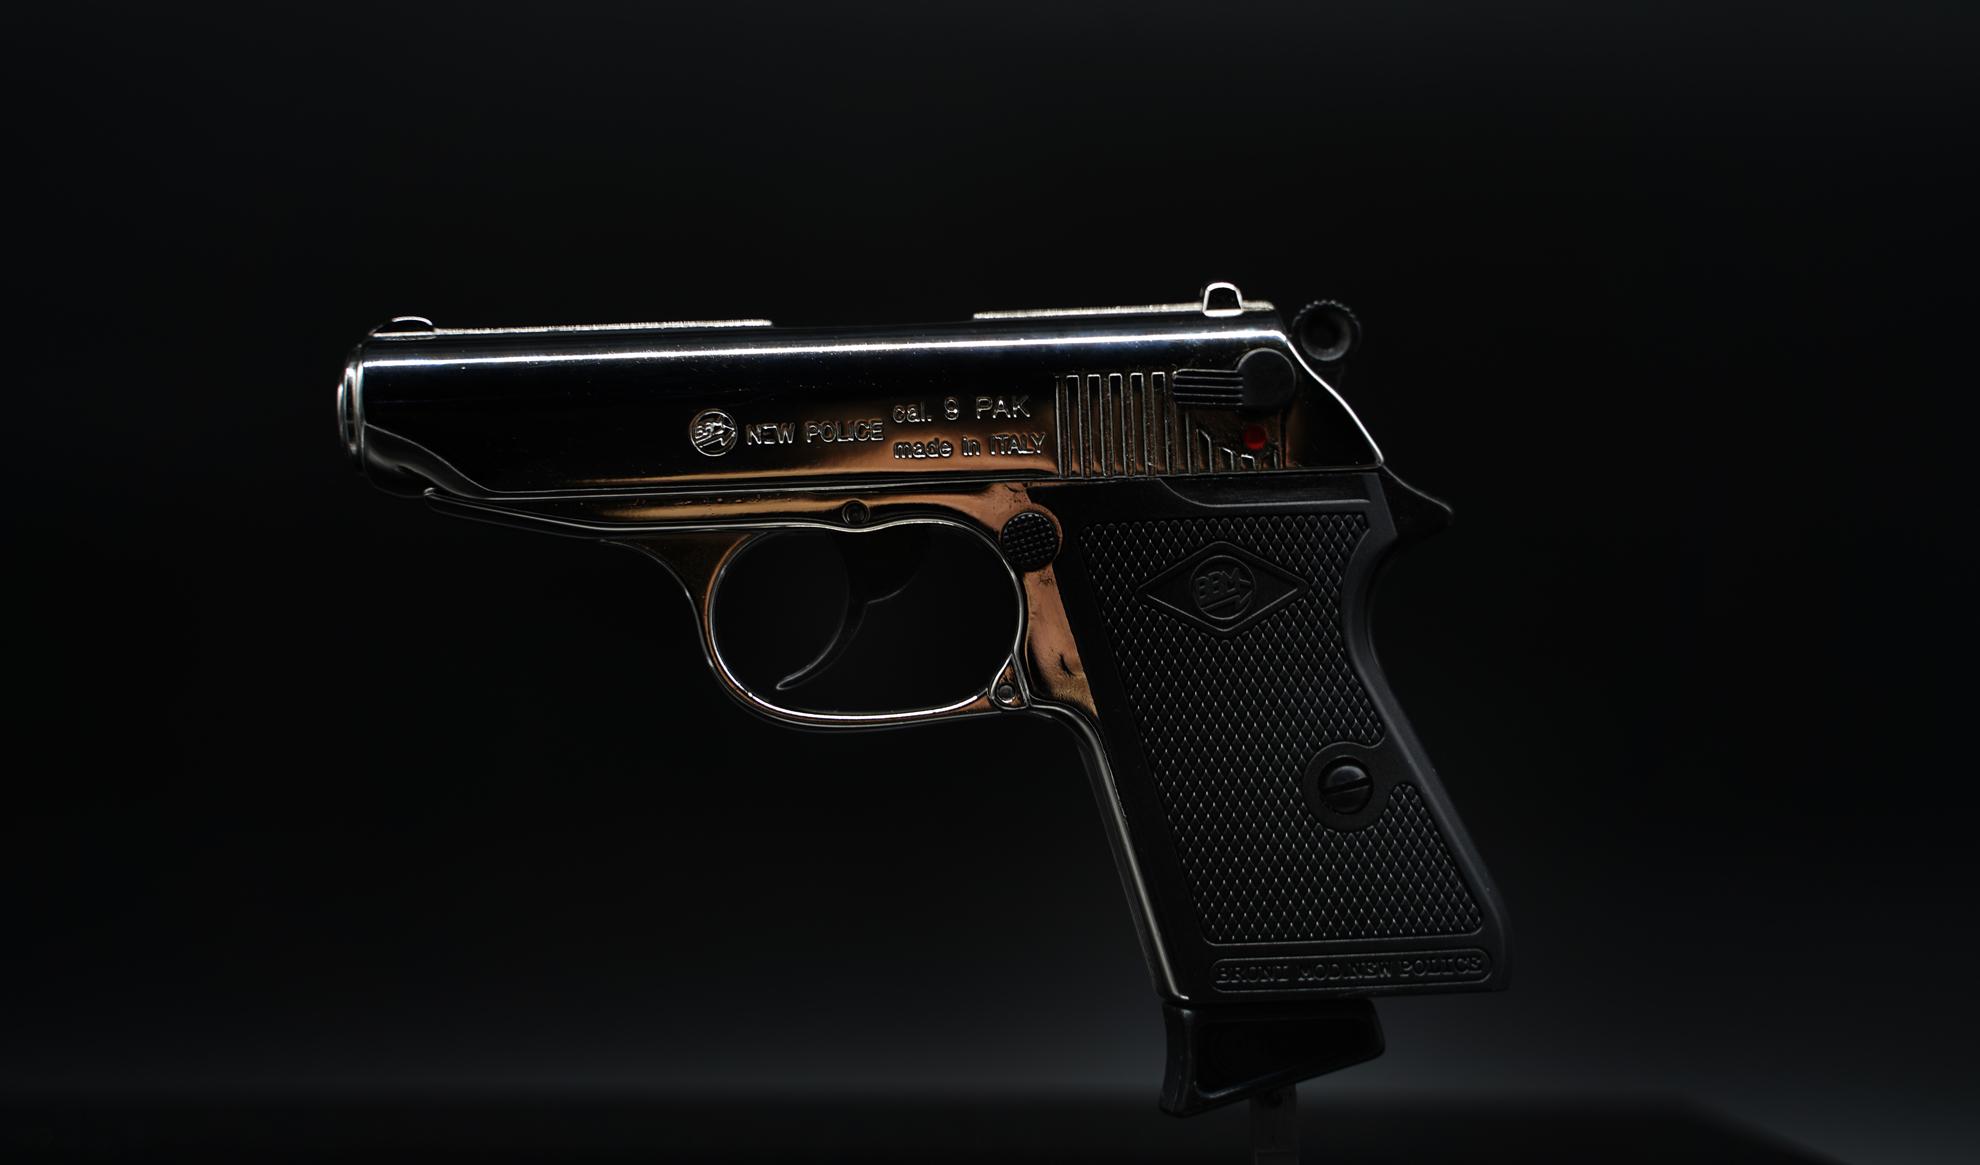 bruni guns new police nichel